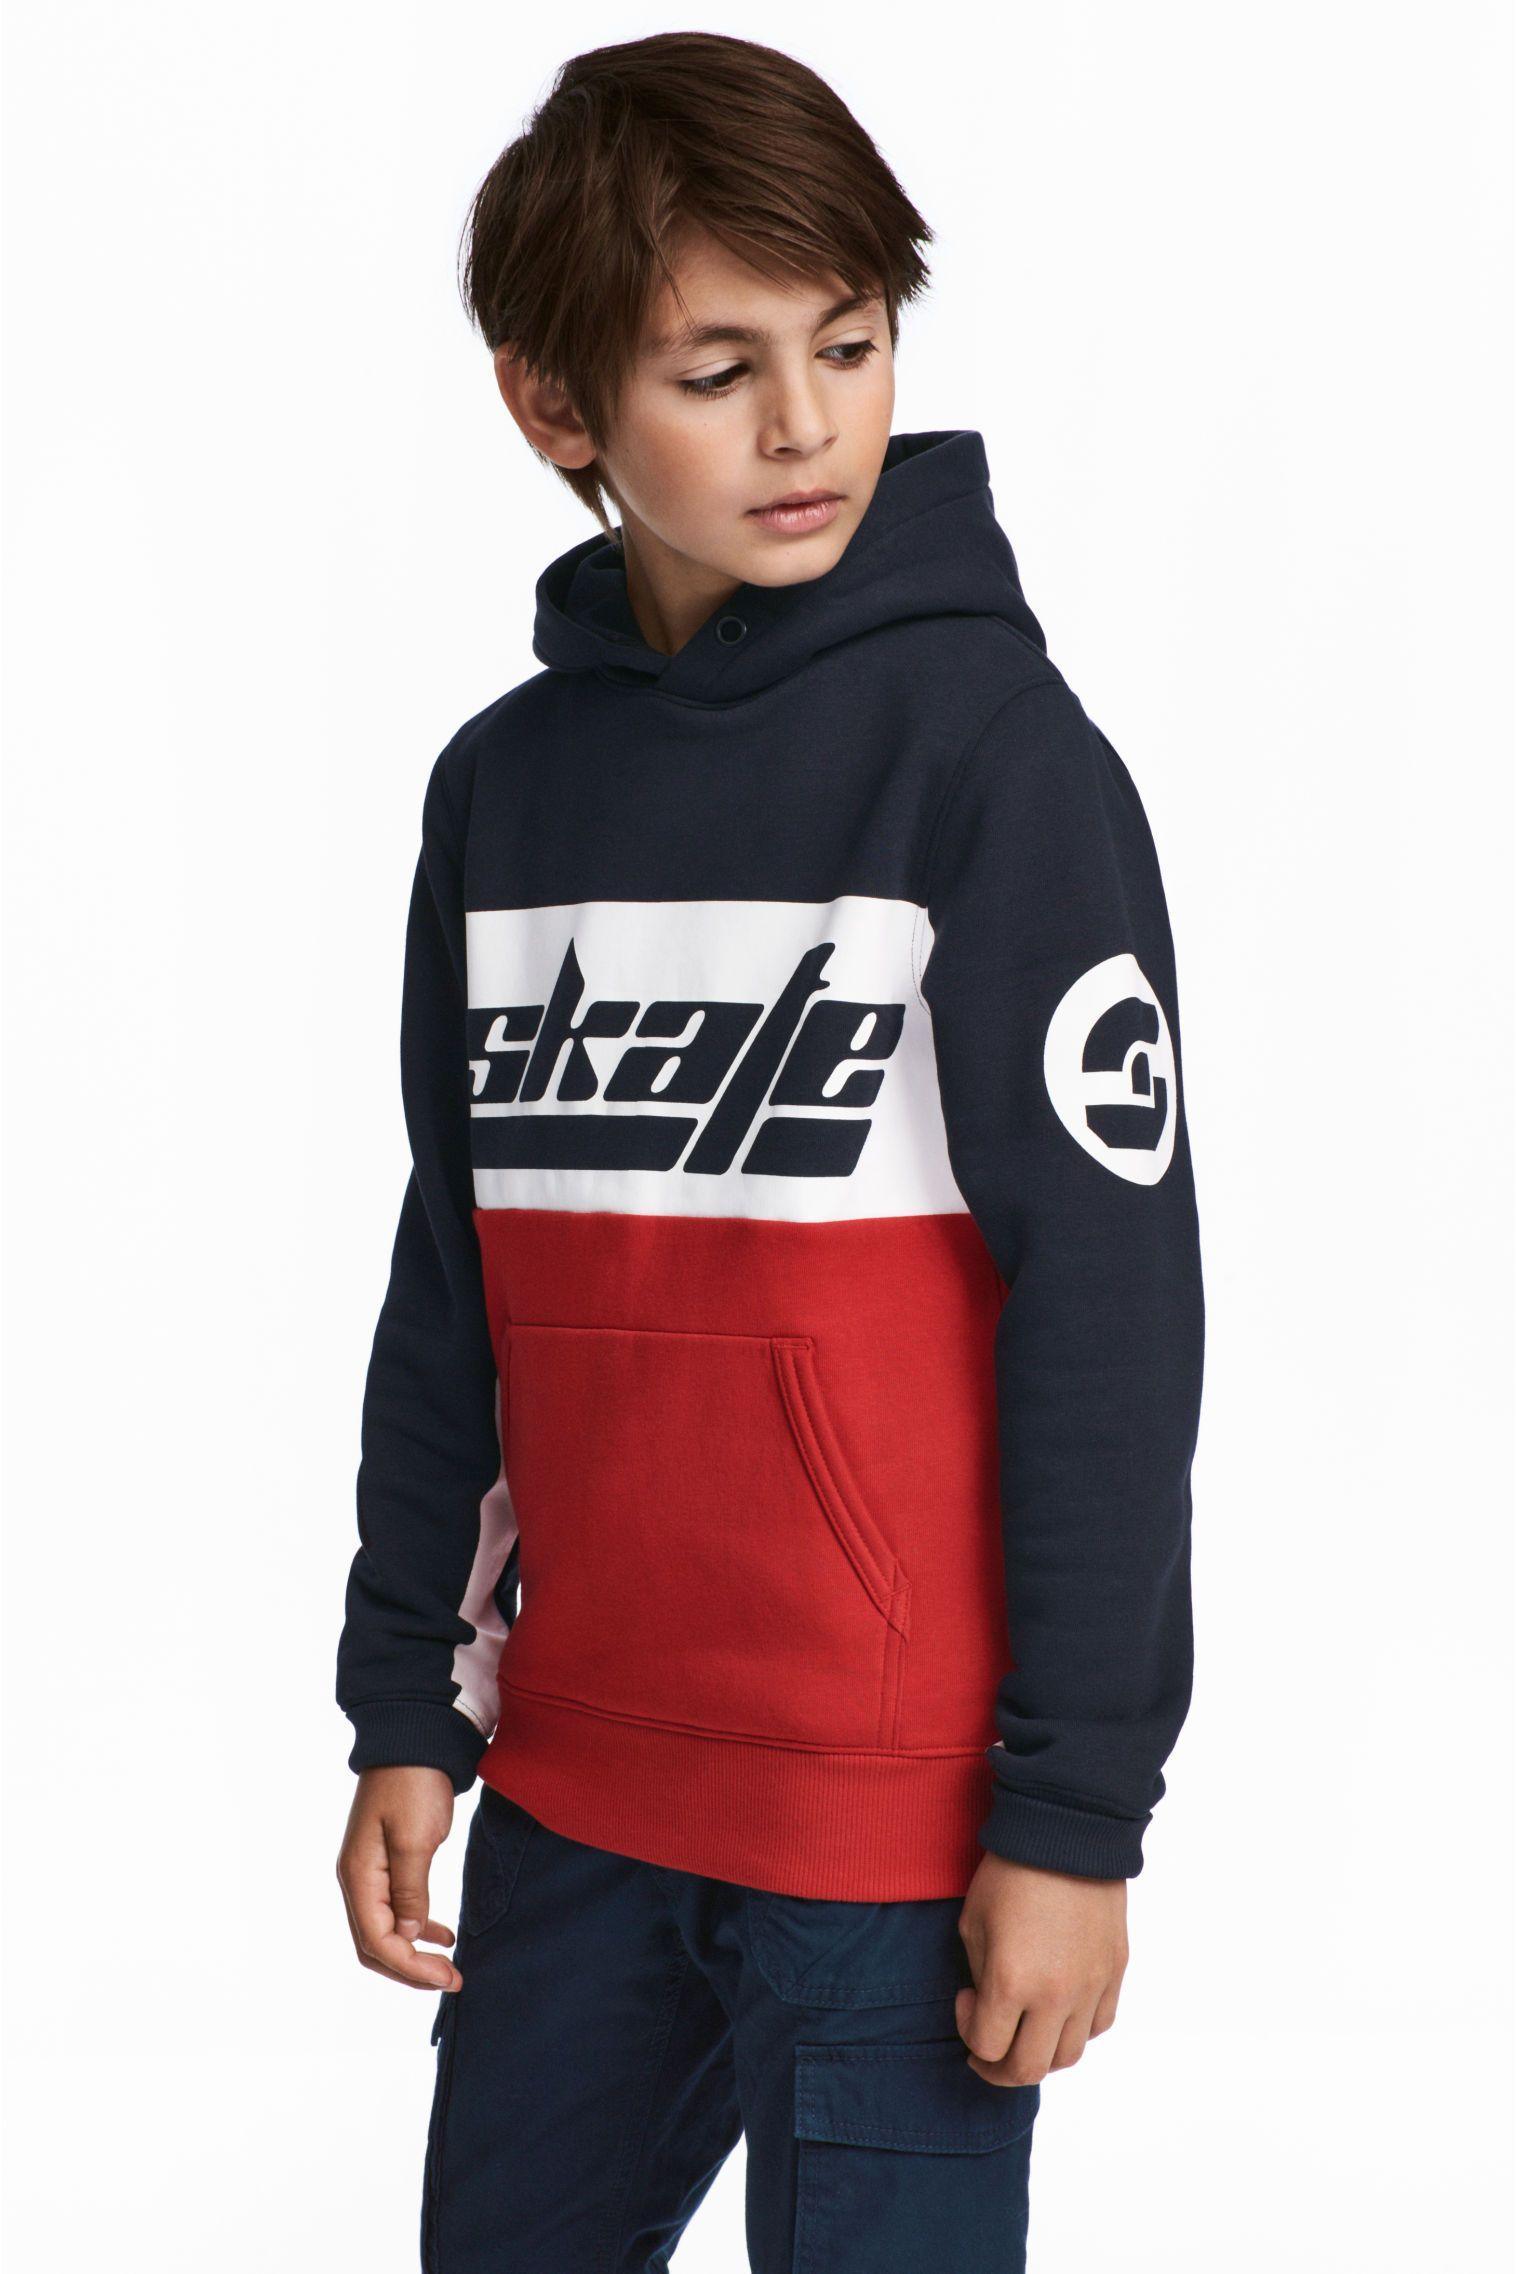 3ce111ead H&M Boys 8-14 y | Sweet Shirts's | Kids fashion boy, Kids outfits ...